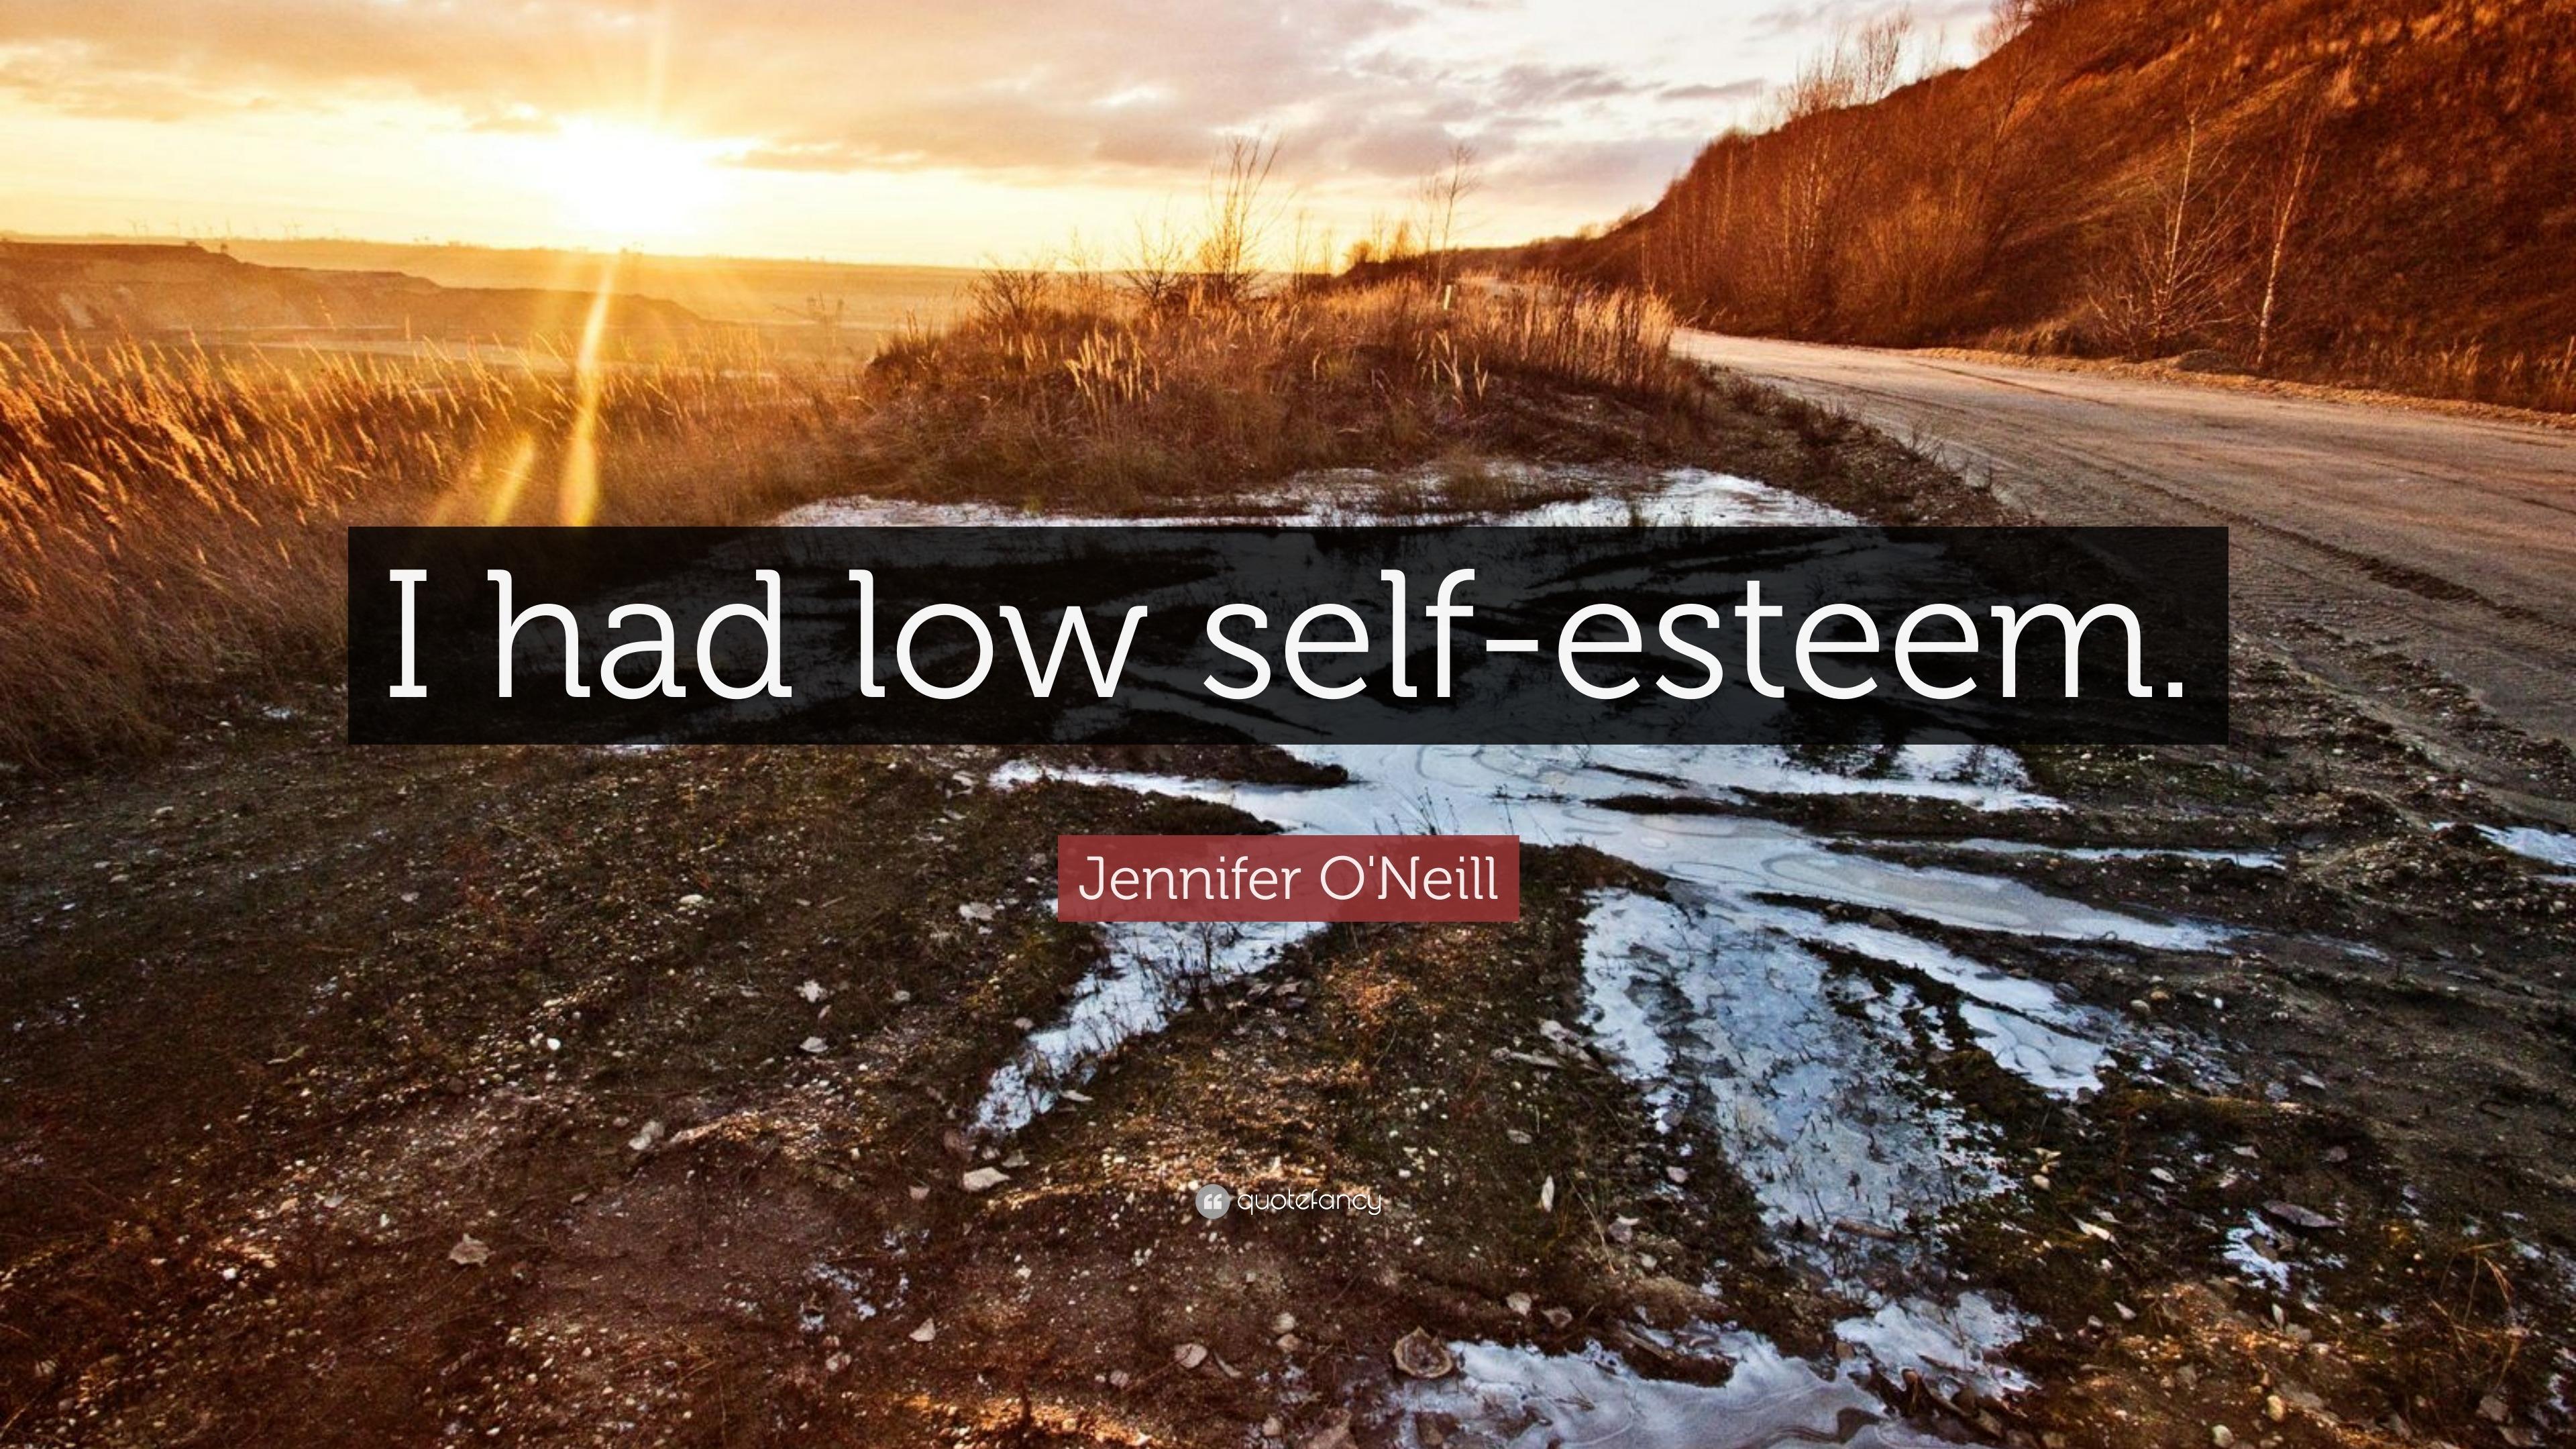 Jennifer Oneill Quote I Had Low Self Esteem 7 Wallpapers